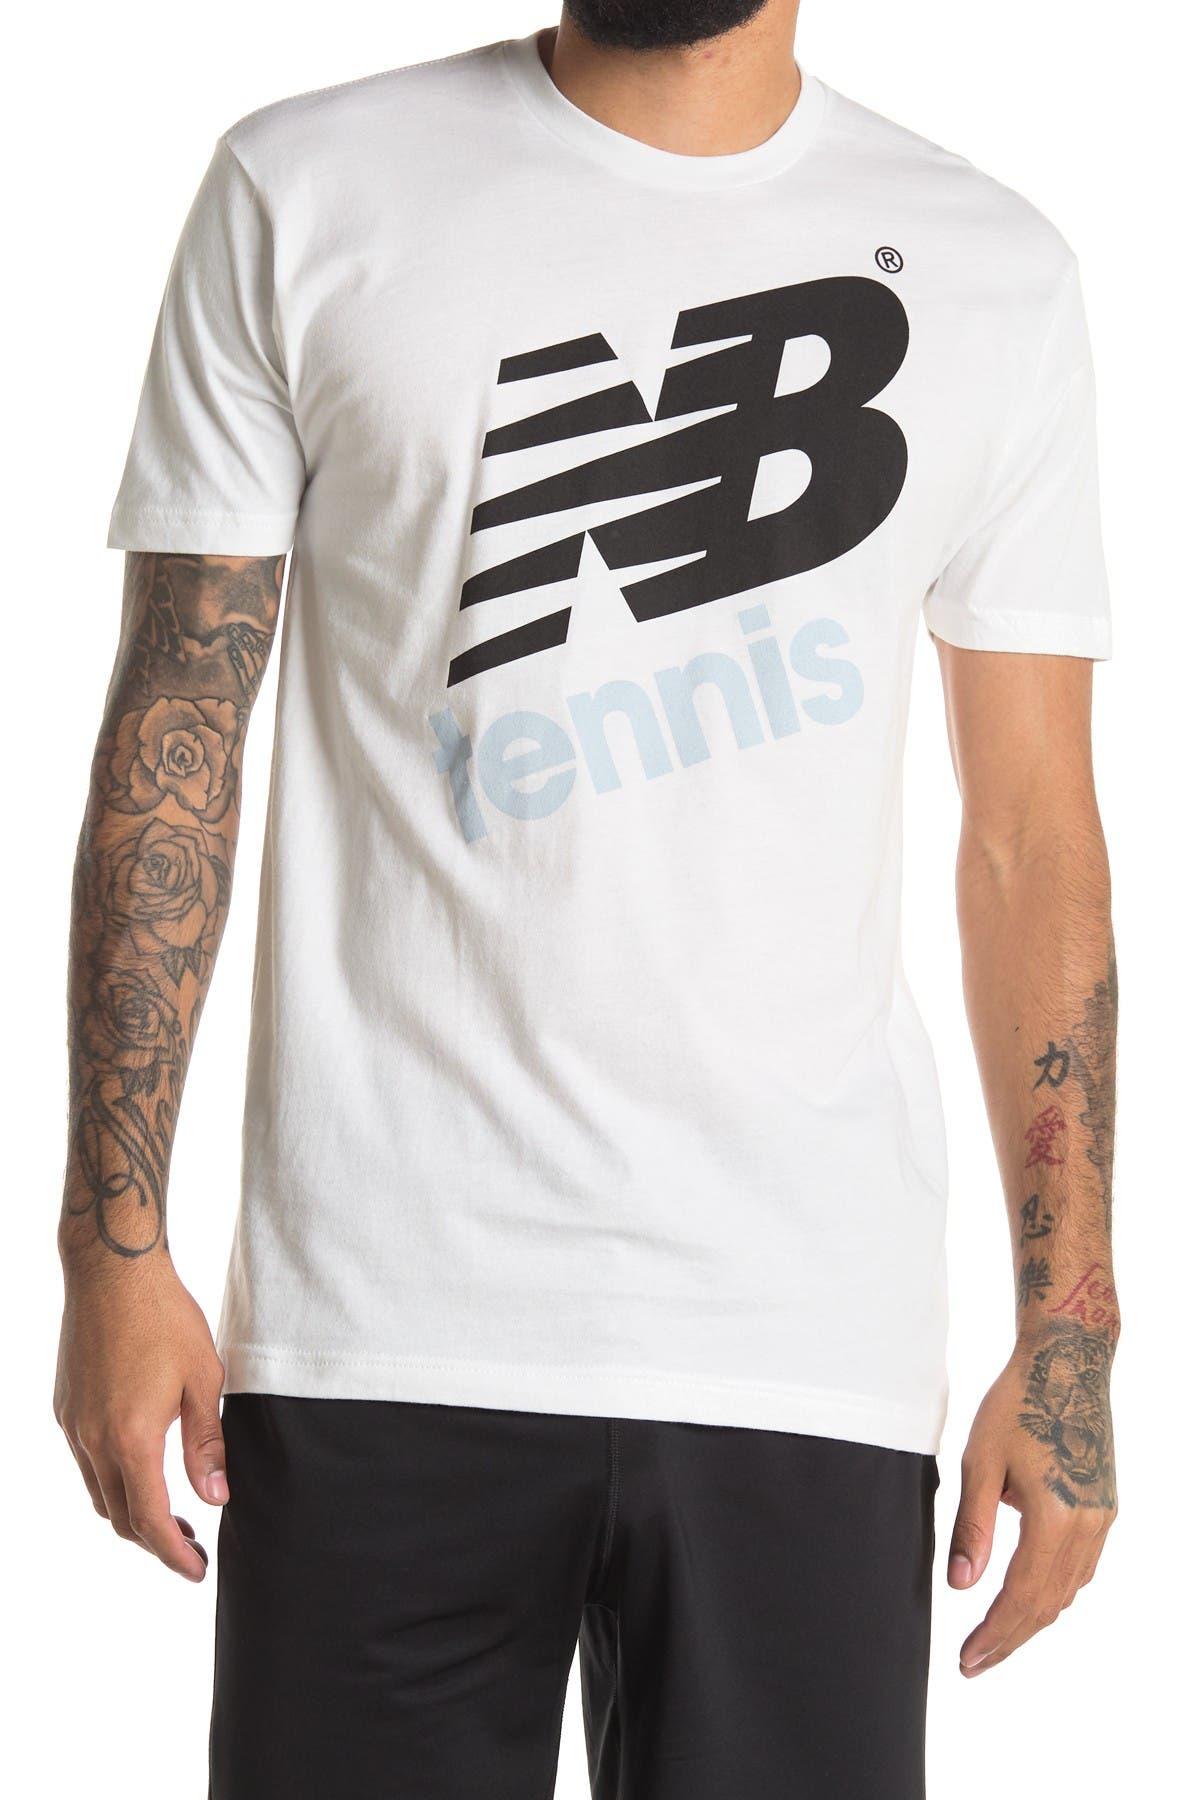 Image of New Balance Tennis Graphic T-Shirt